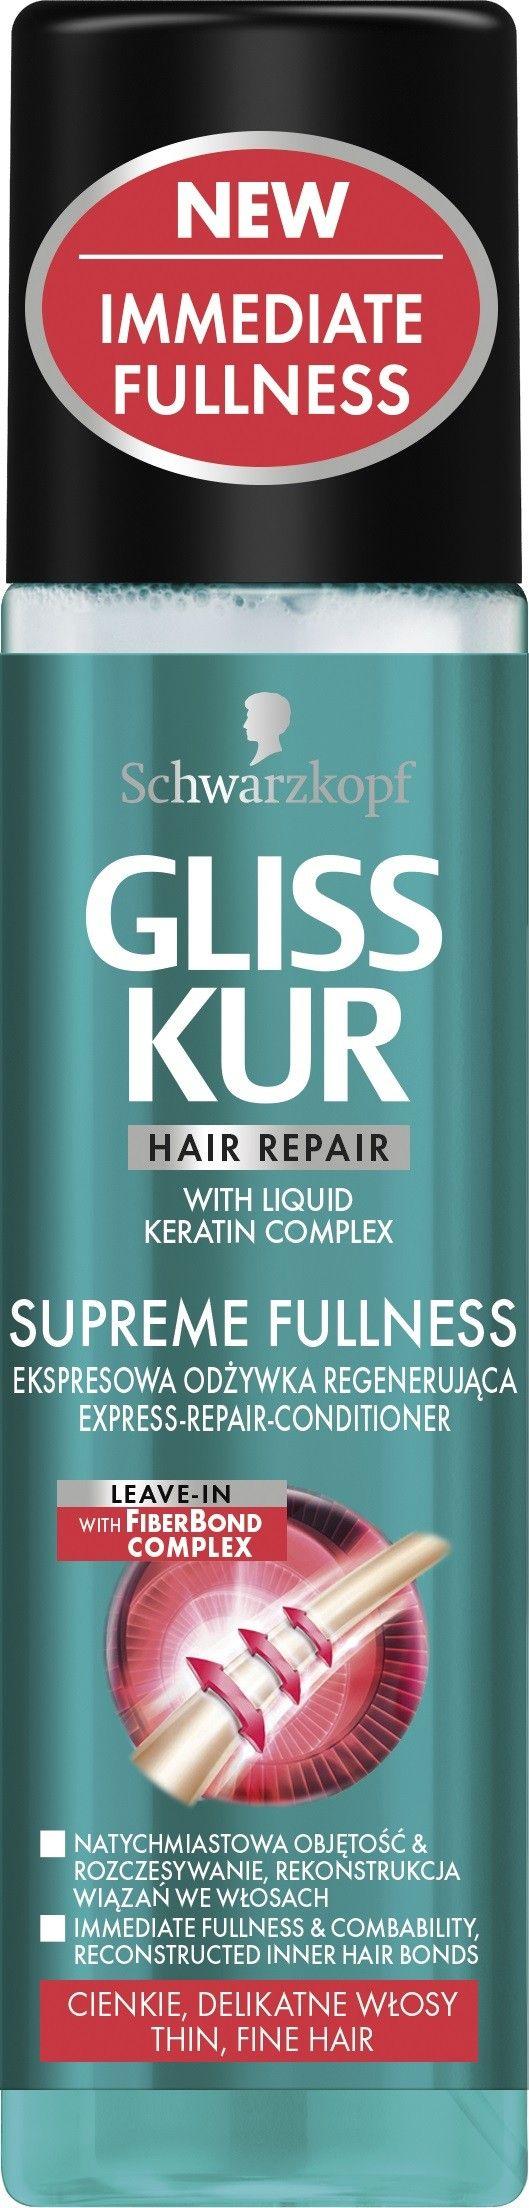 Schwarzkopf Gliss Kur H*GLISS K.Supreme Fullness ERC 200ml - 68075649